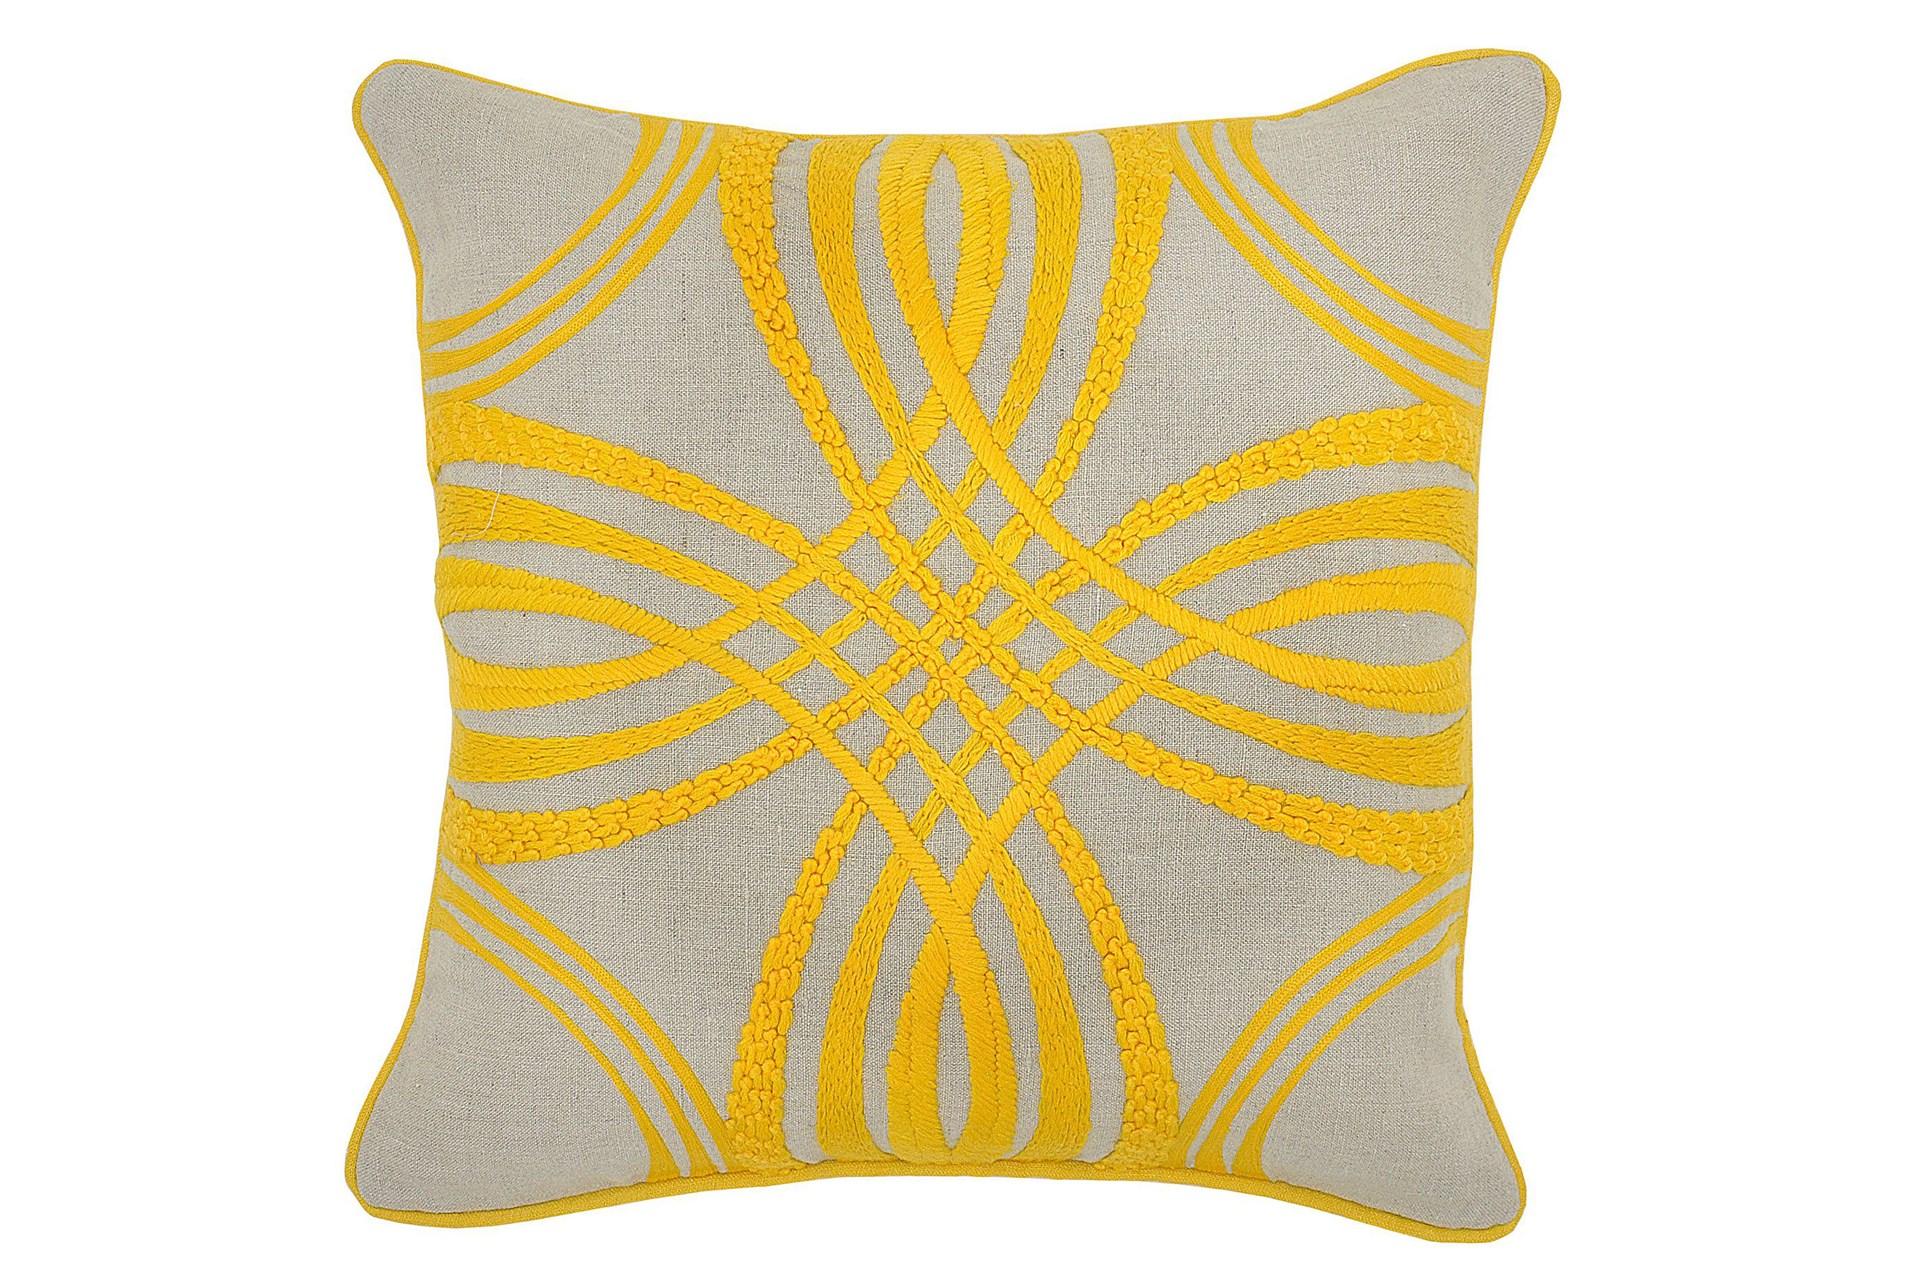 Throw Pillows for Your Home Décor